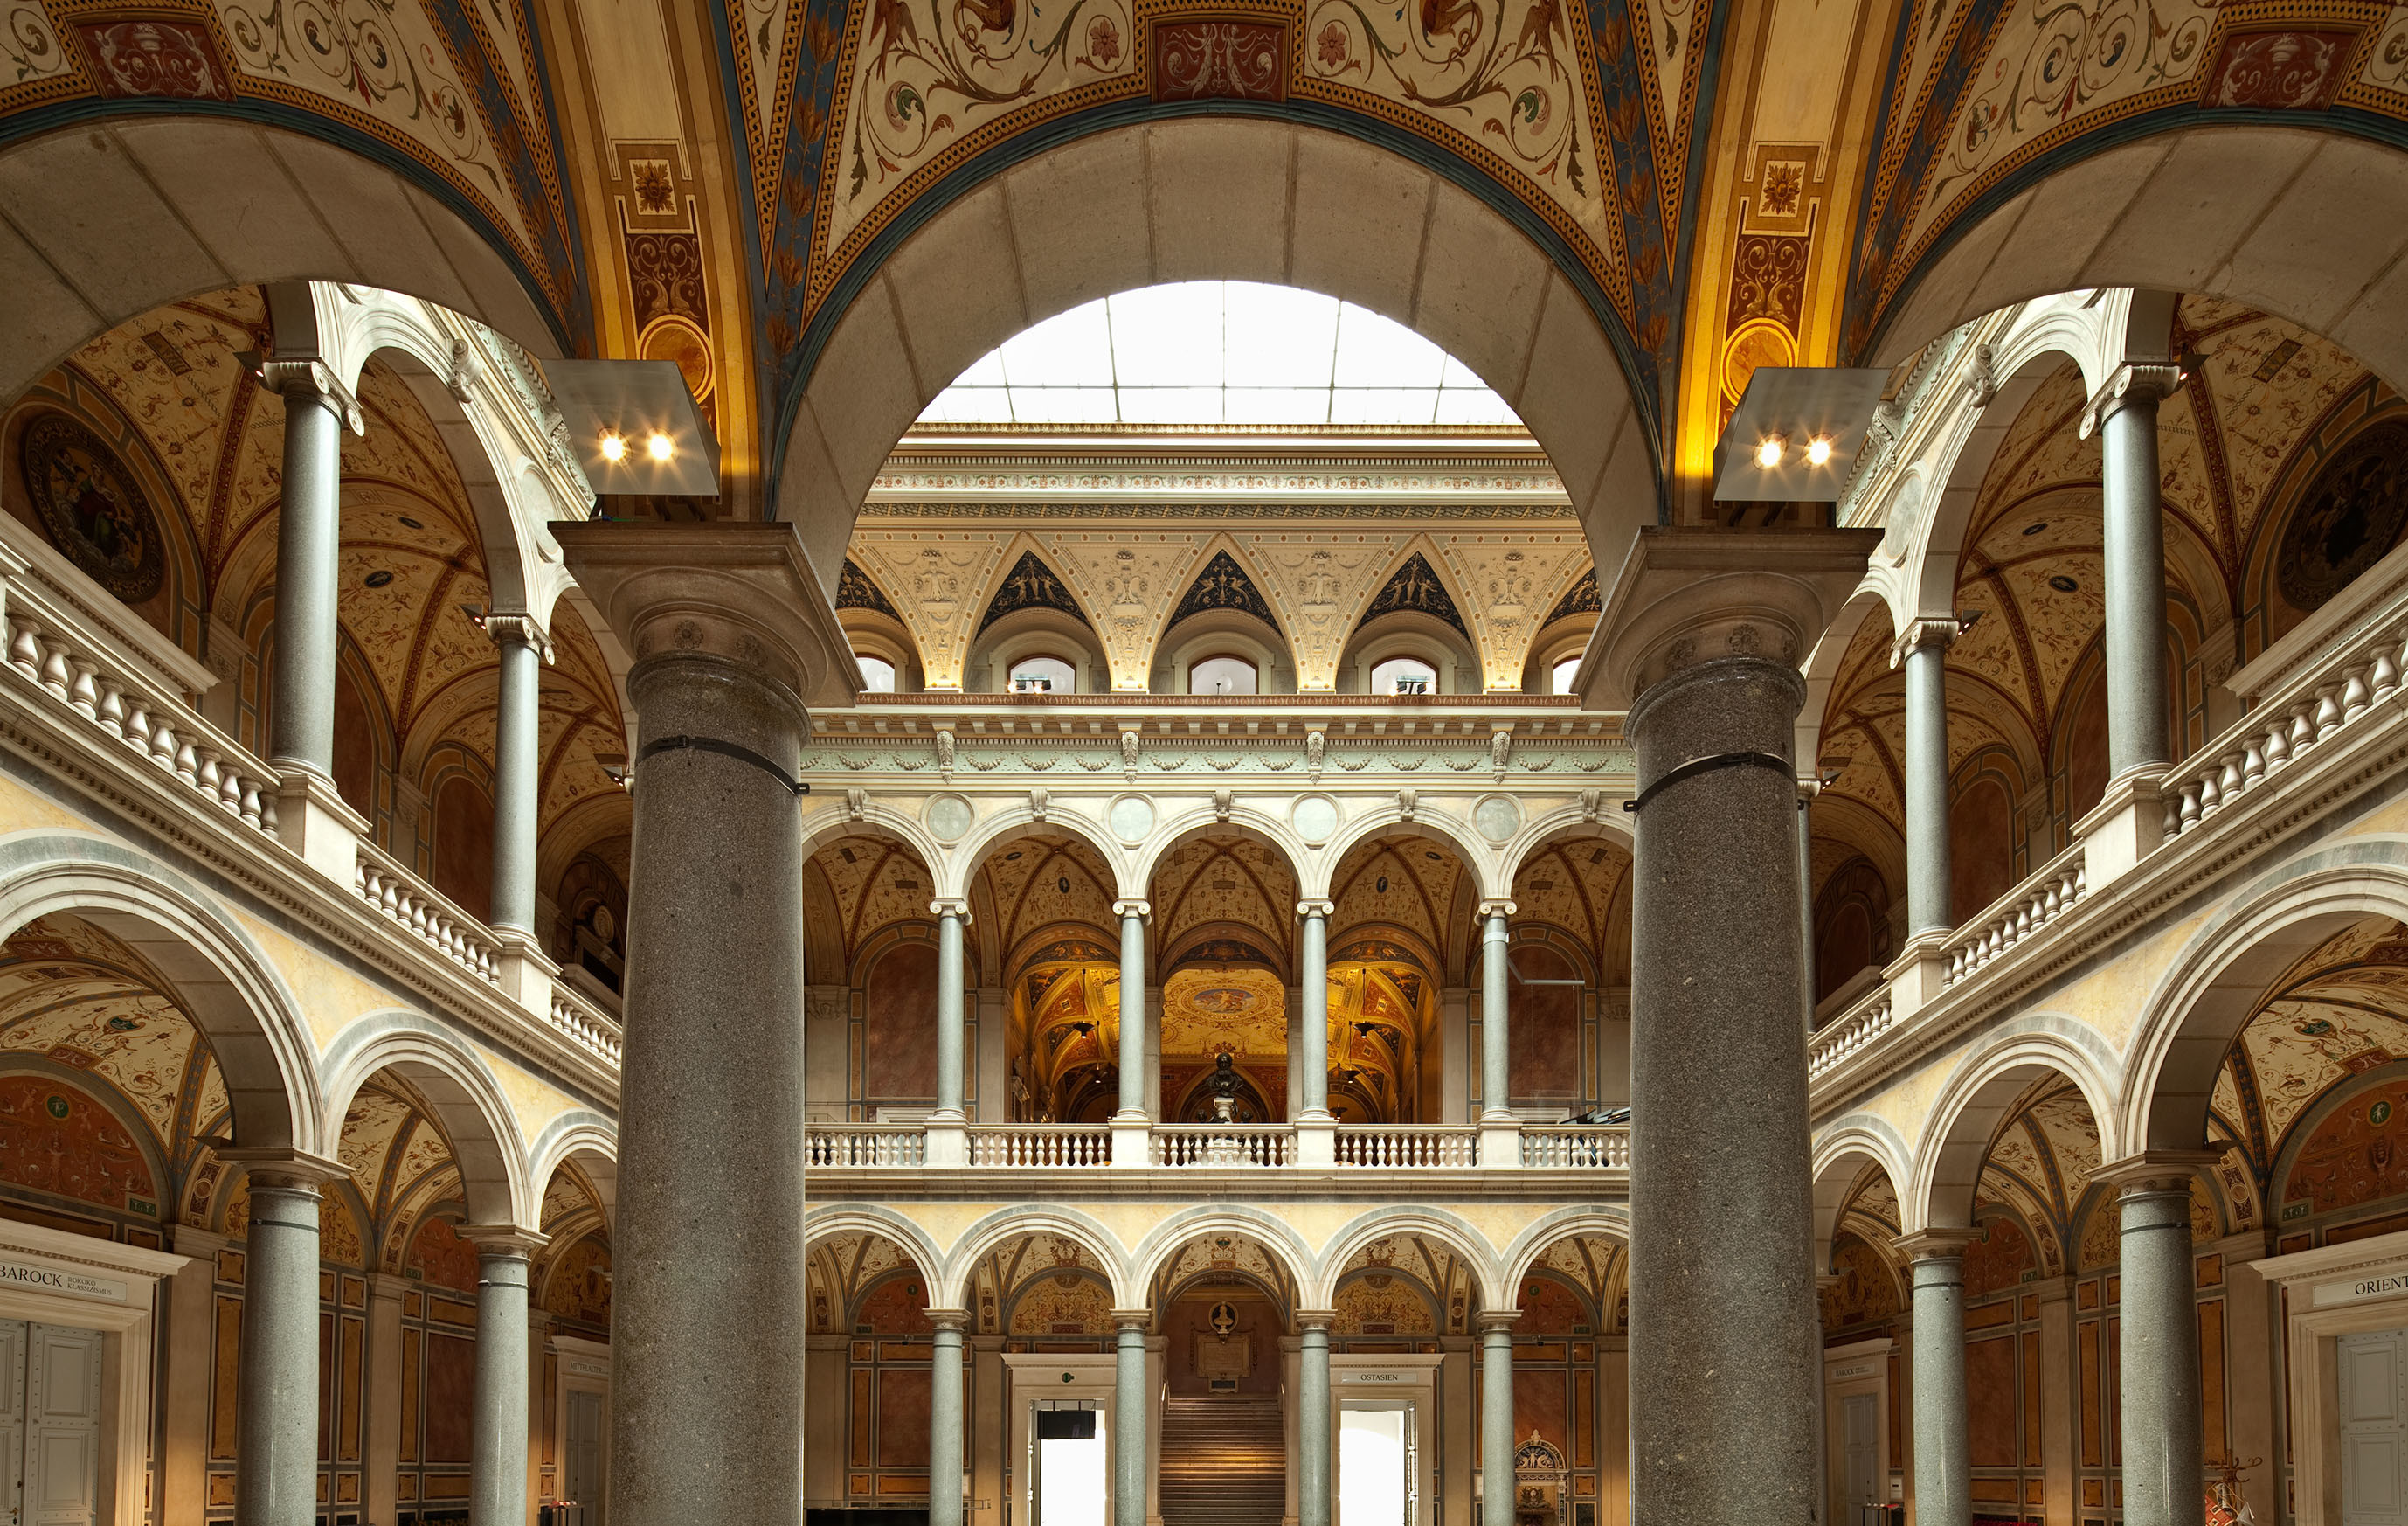 MAK – Museum of Applied Arts | Sights | Vienna